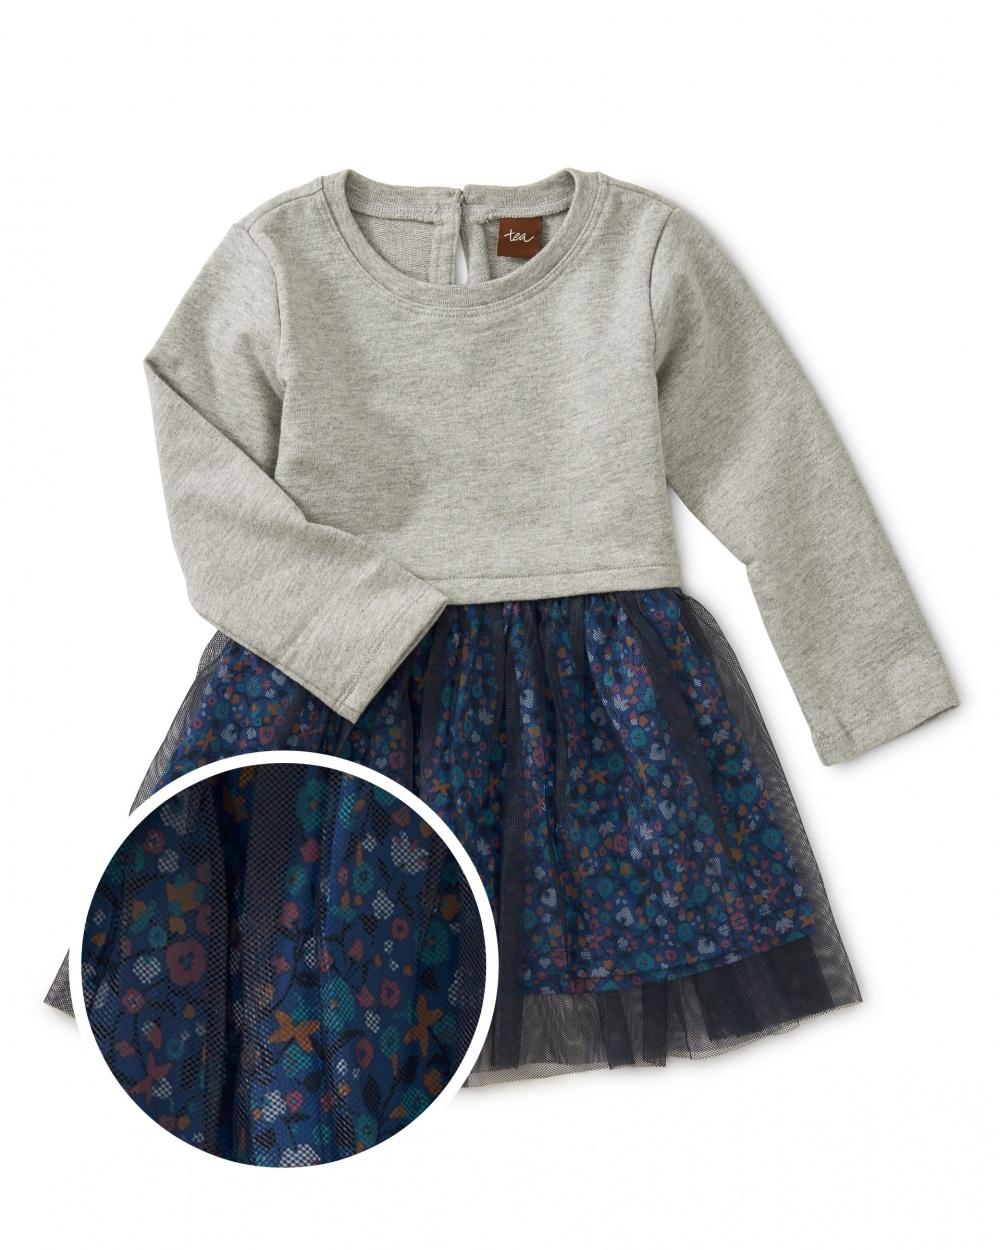 Tulle Skirted Baby Dress